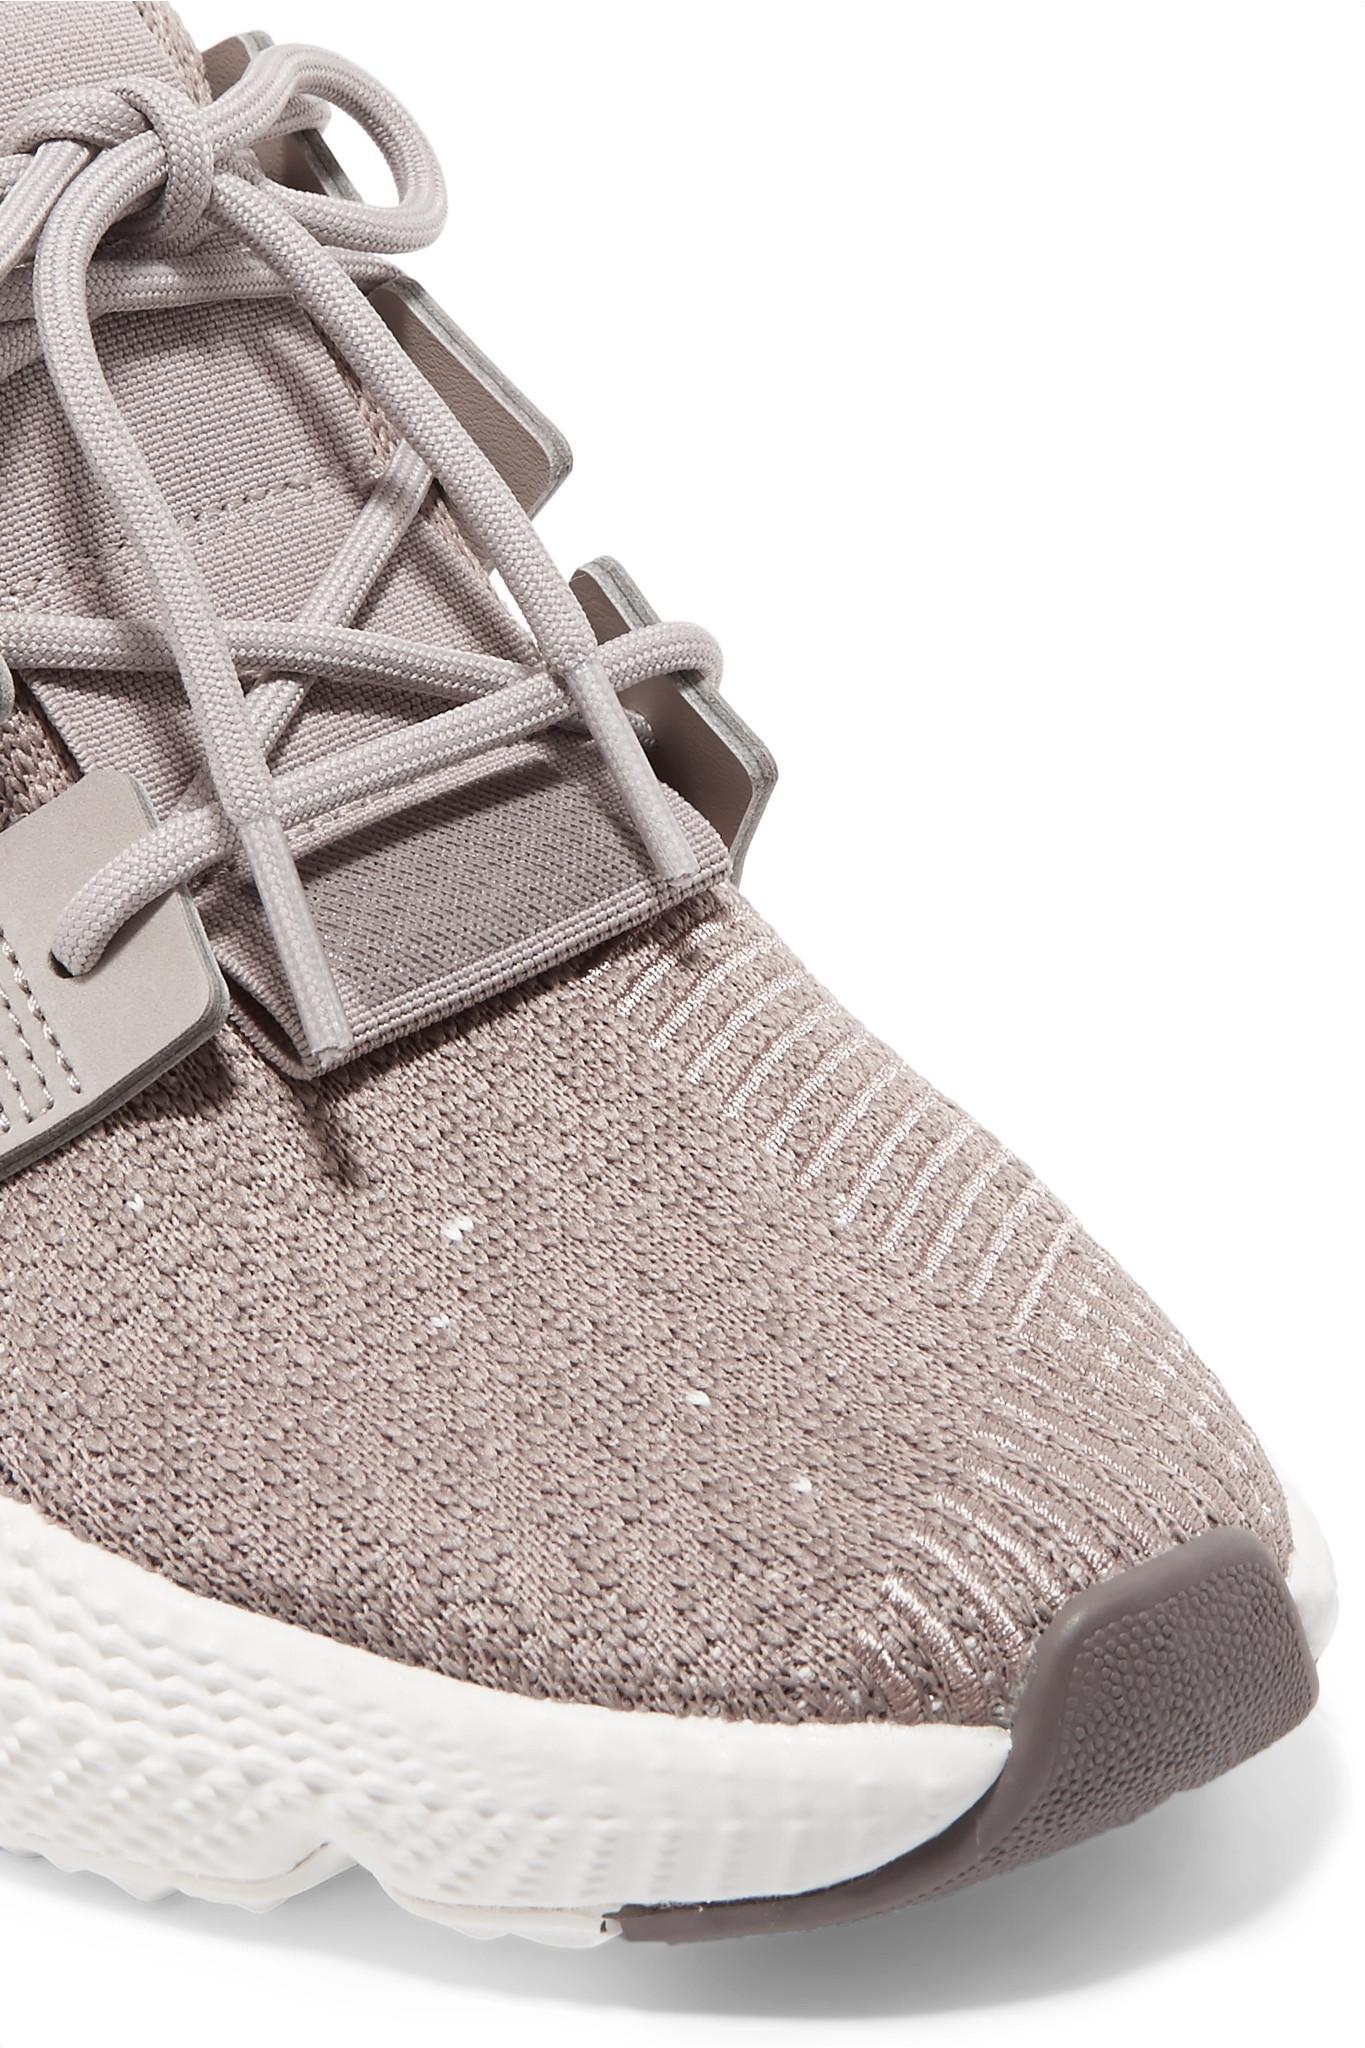 41955a11e414 Adidas Originals - Multicolor Prophere Stretch-knit Sneakers - Lyst. View  fullscreen